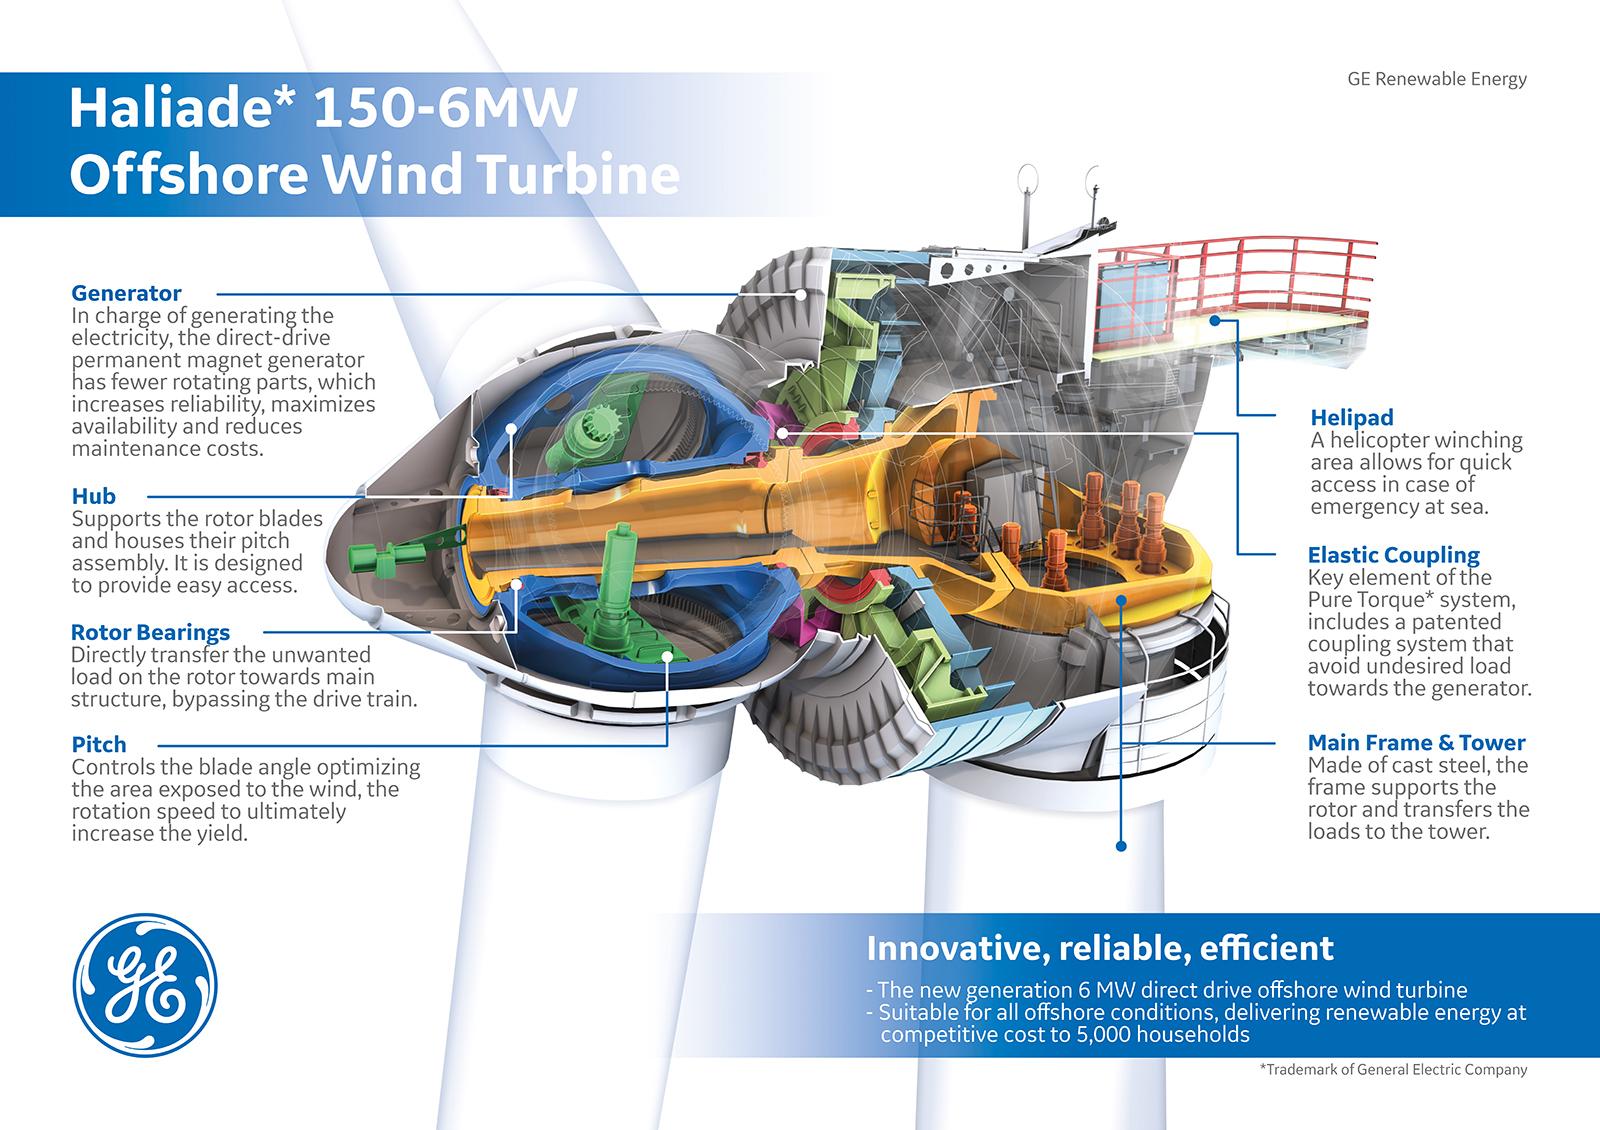 GE installs 1st offshore wind turbine at Merkur Windfarm